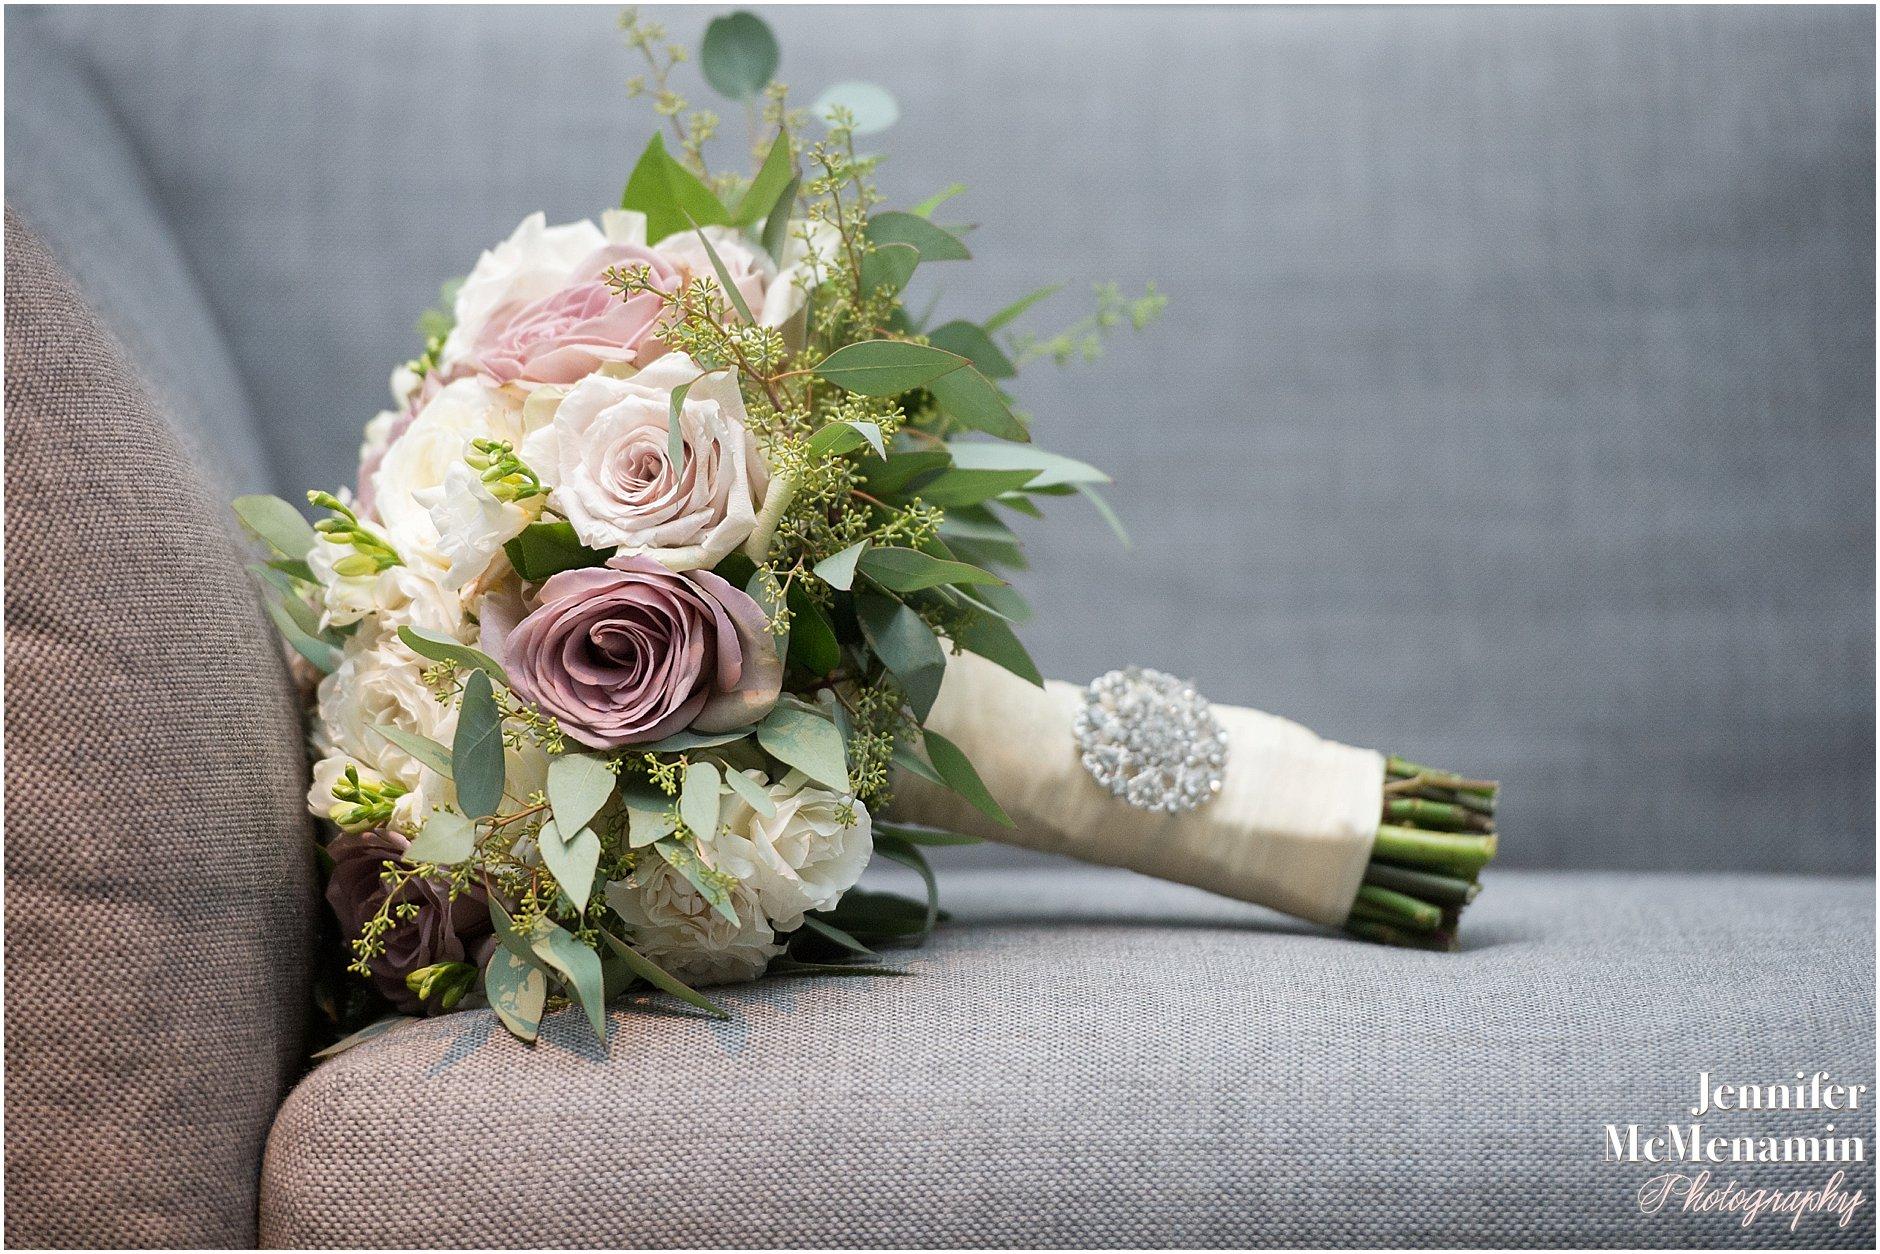 Jennifer-McMenamin-Photography-Sagamore-Pendry-wedding_0469.jpg